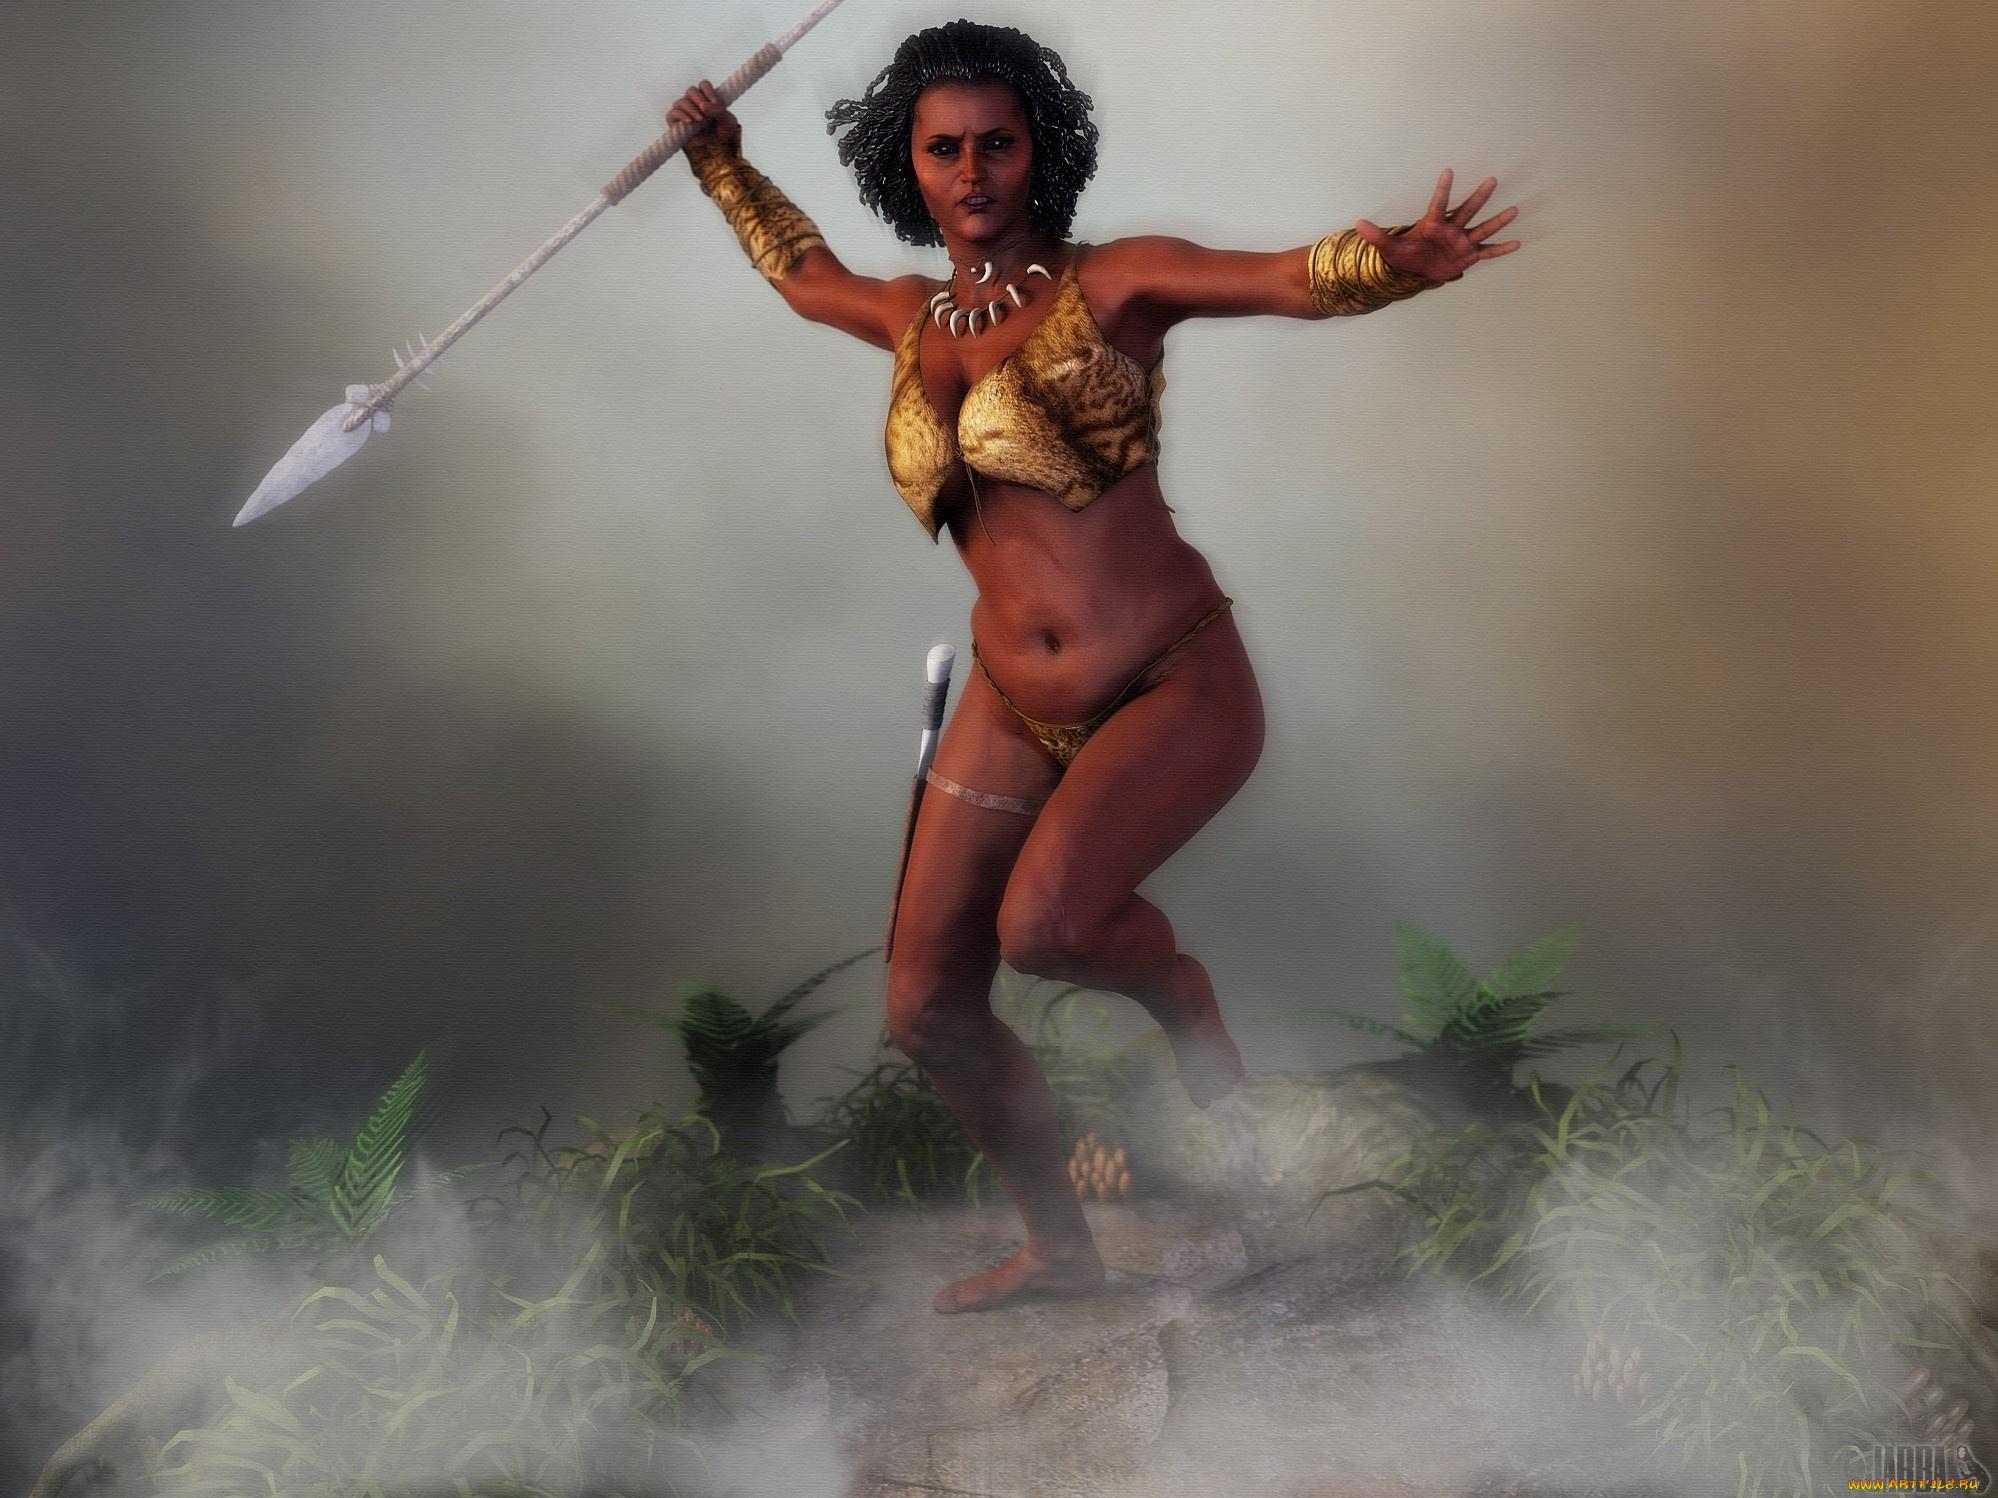 Картинки амазонки с надписью, подарки